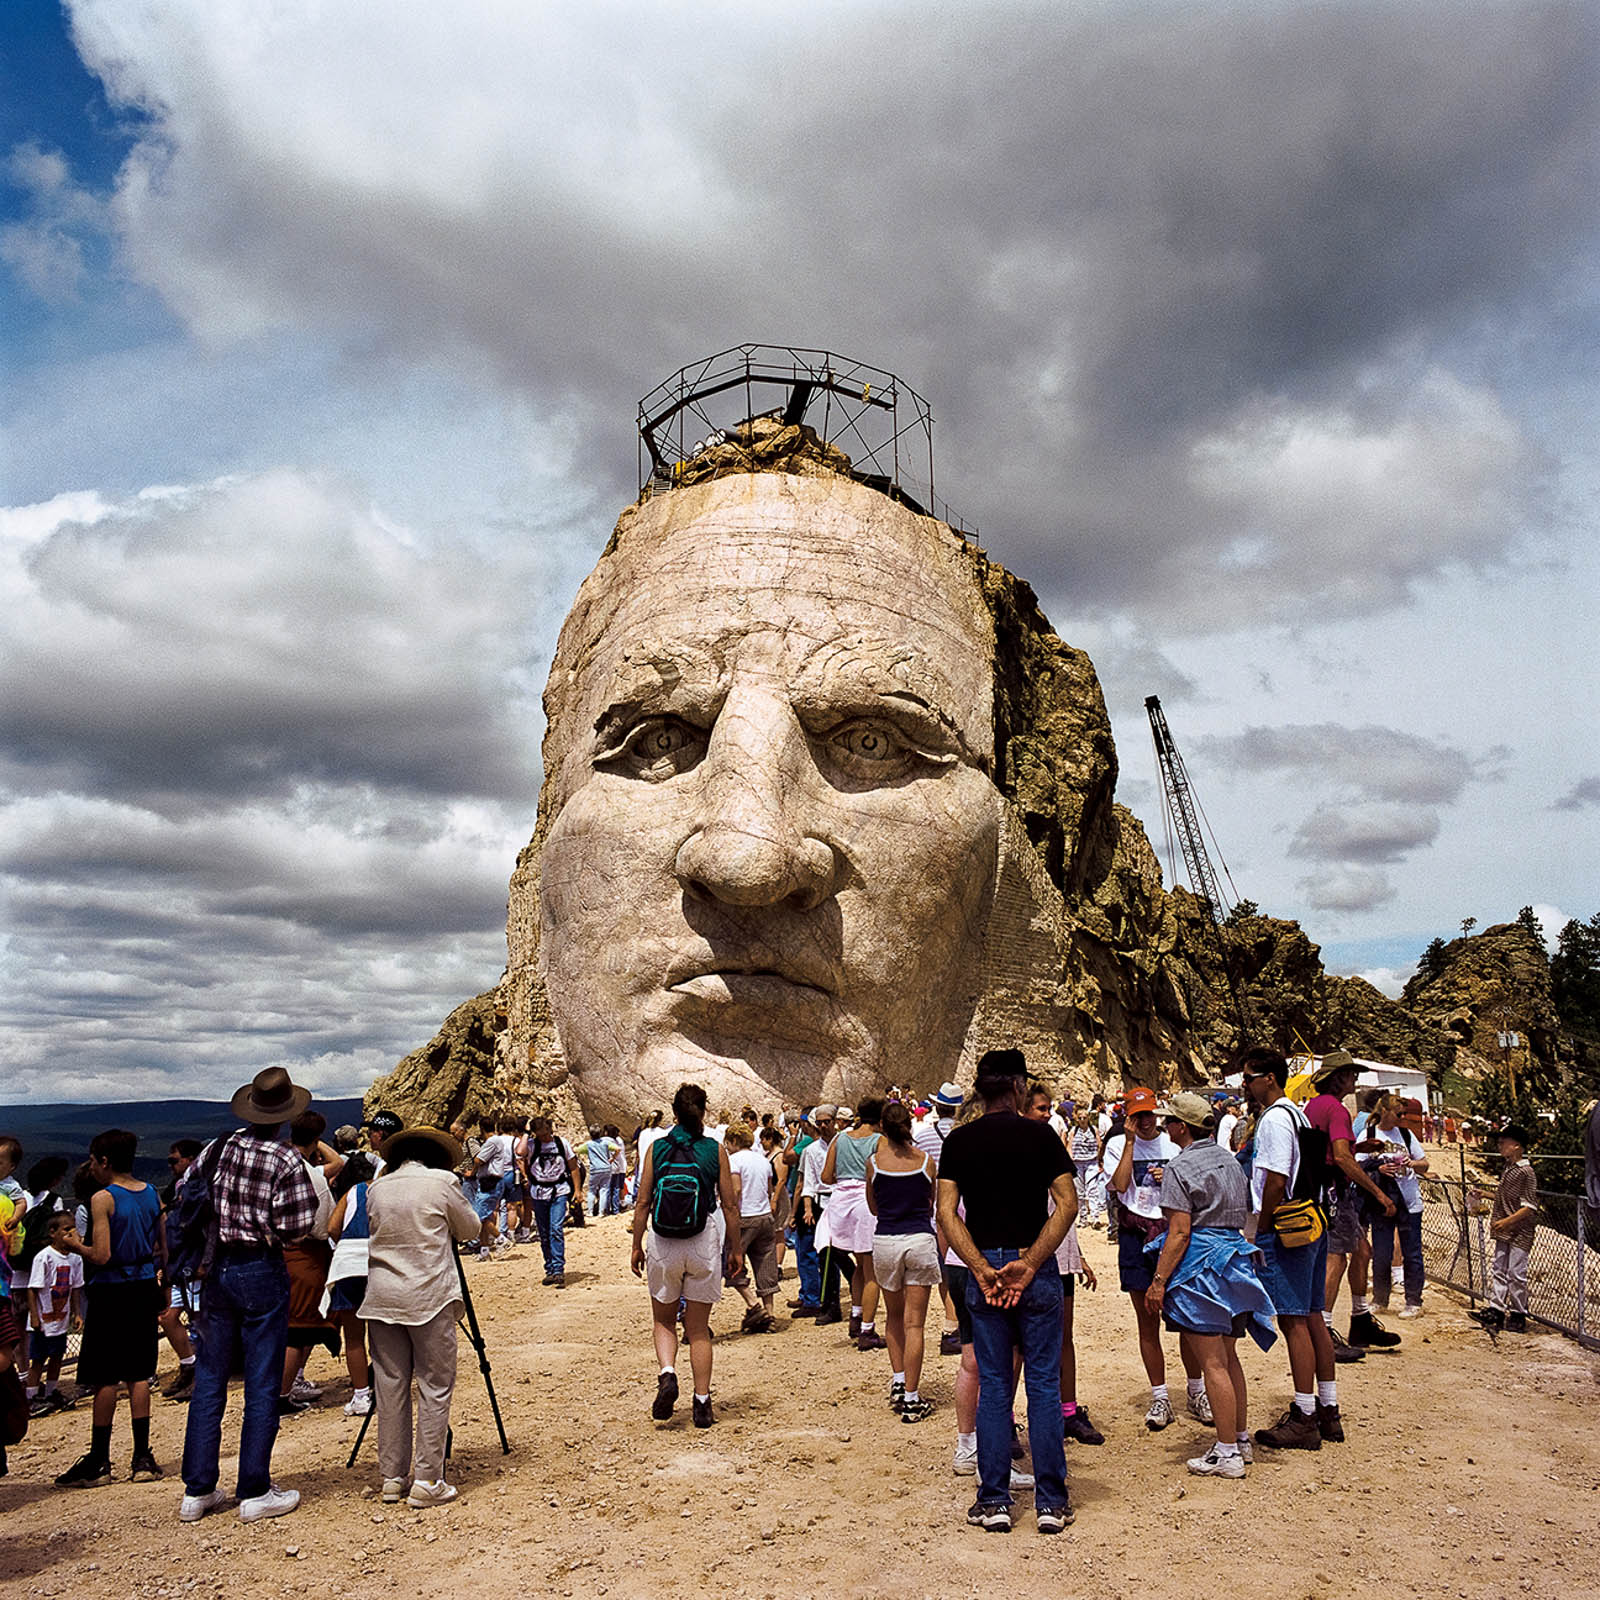 Visitors Day, Crazy Horse Monument, South Dakota 1999